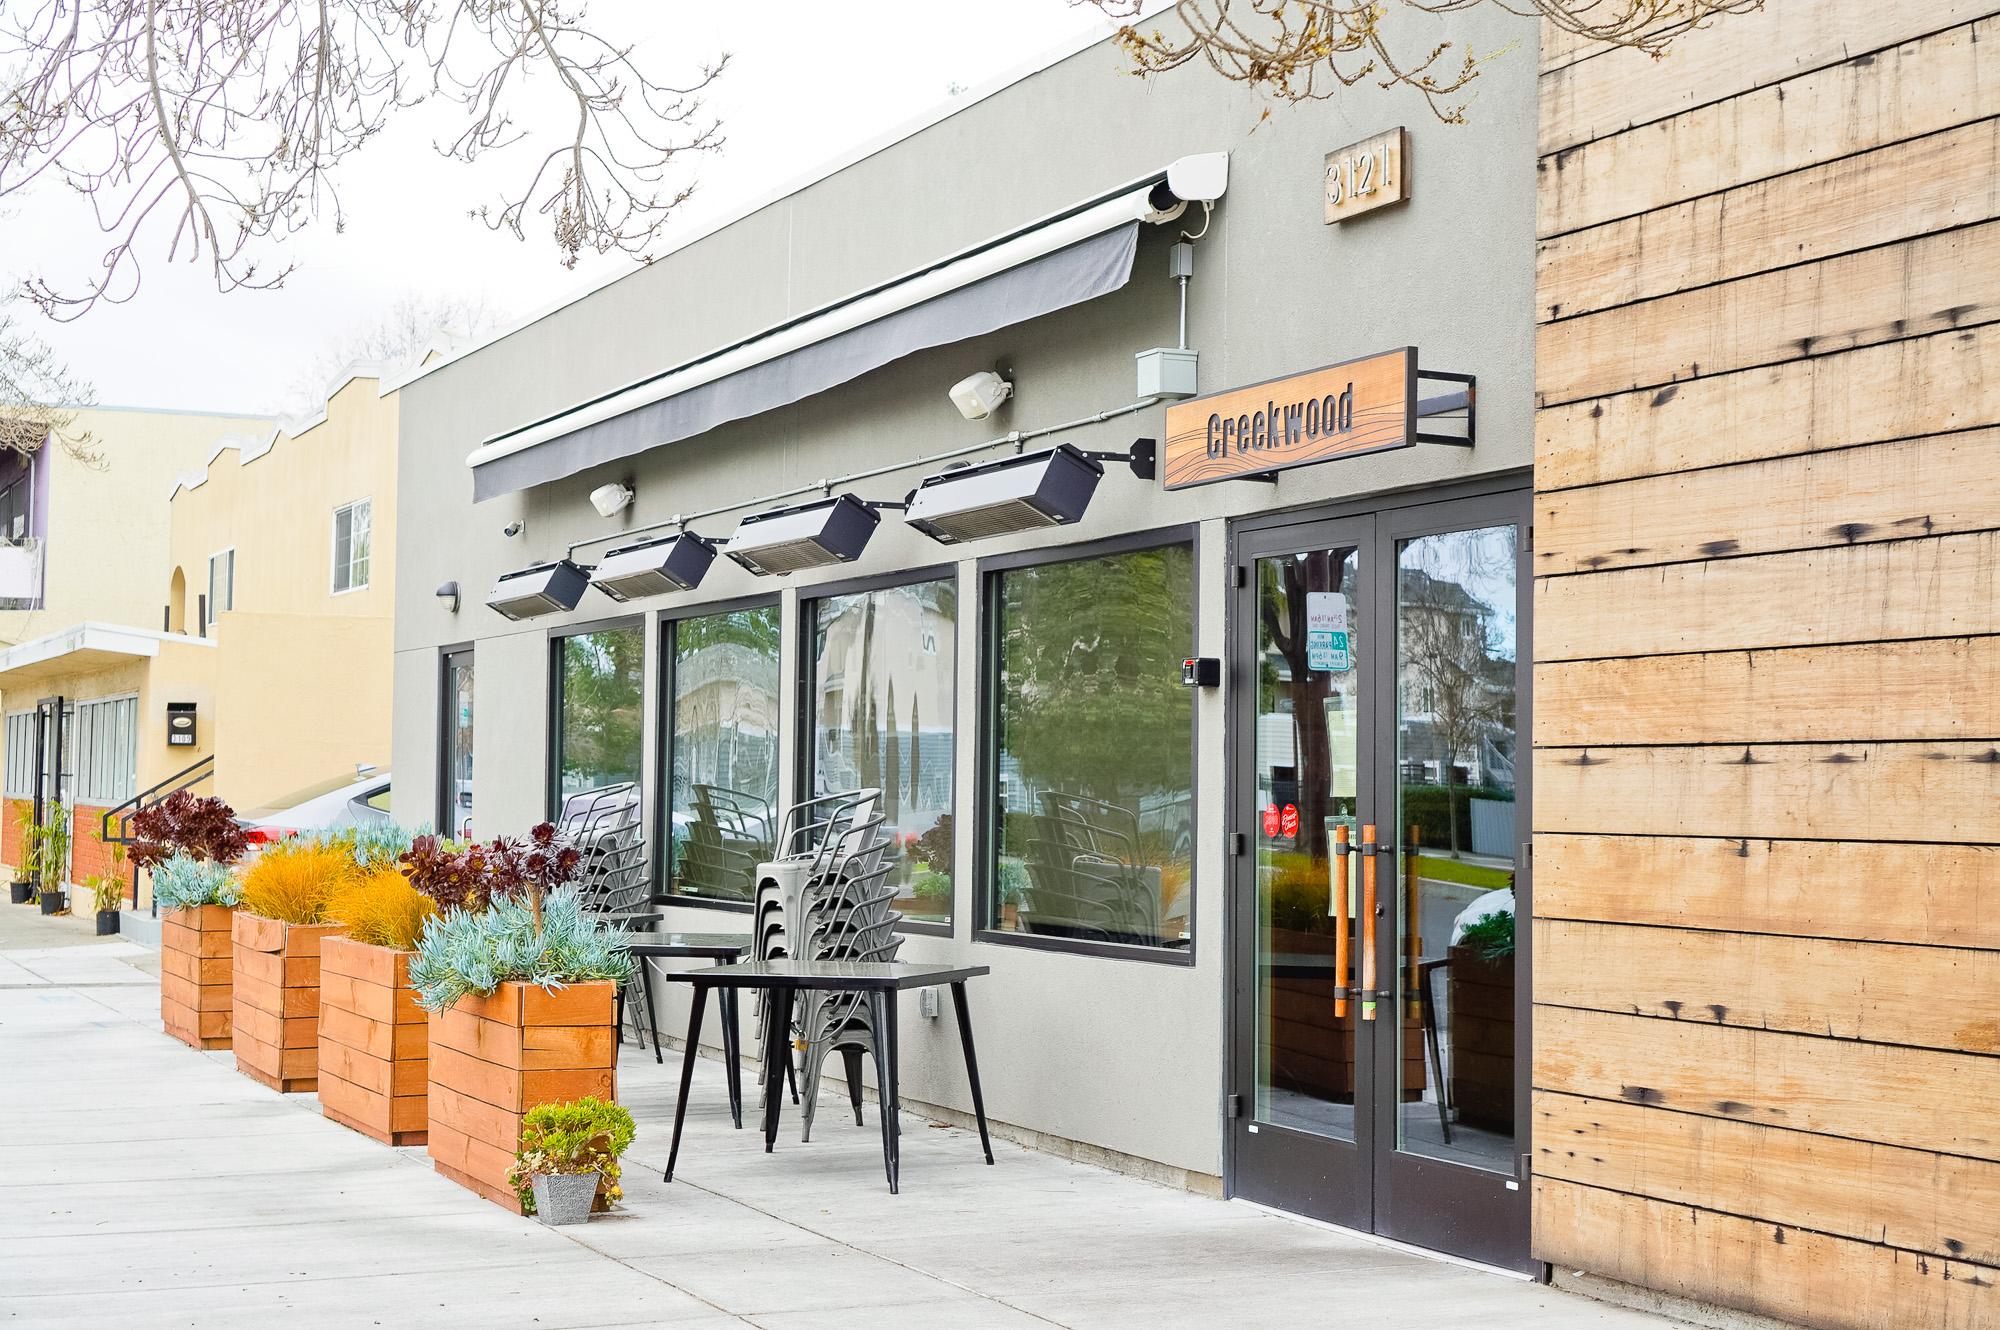 Engraved cedar wood sign on concrete walkl for Creekwood, a Californian-Italian restaurant in Berkeley, CA